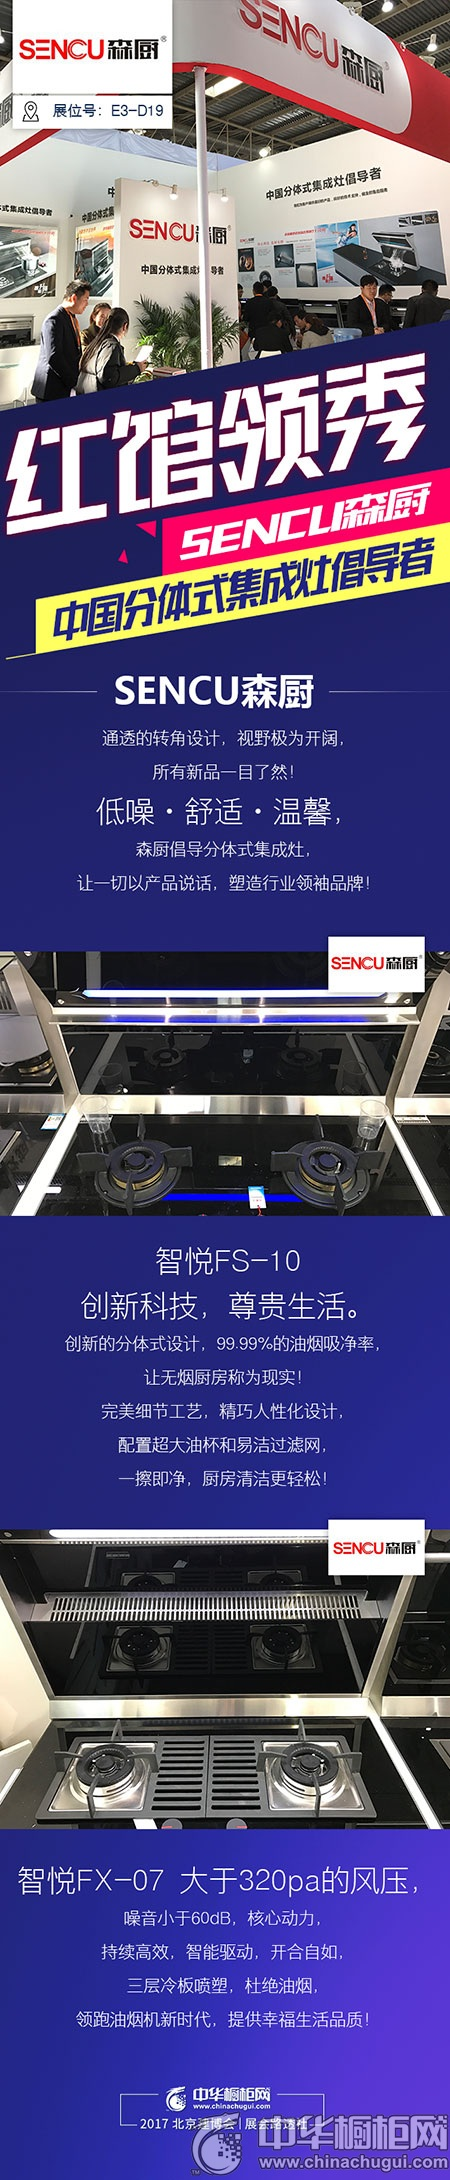 SENCU森厨:中国分体式集成灶倡导者